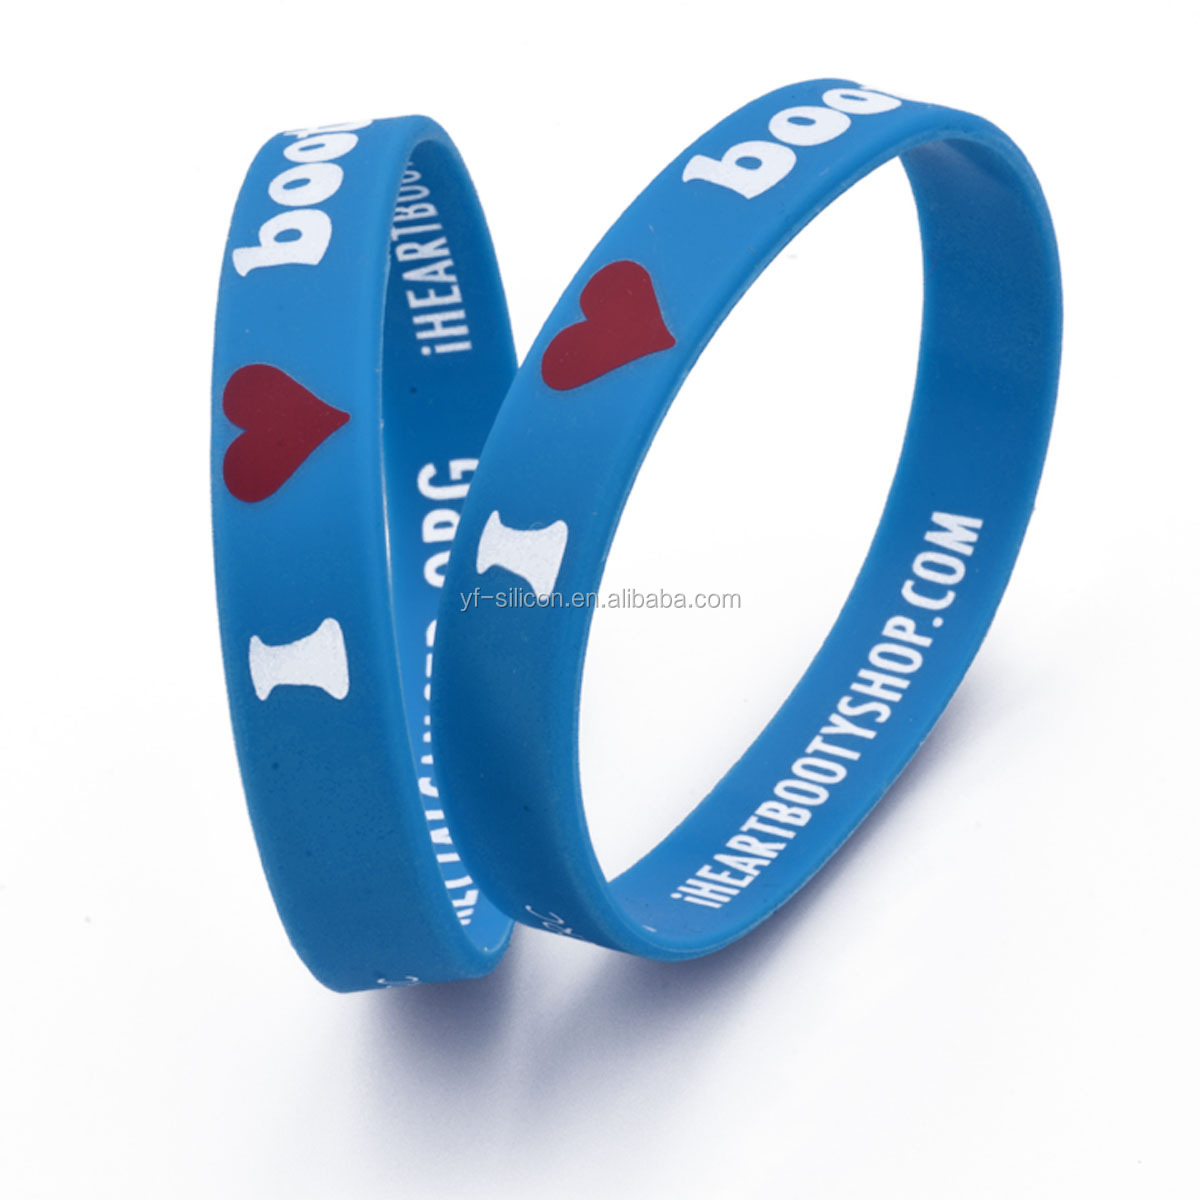 Wholesale Custom Brand Name Silicone Rubber Wristband